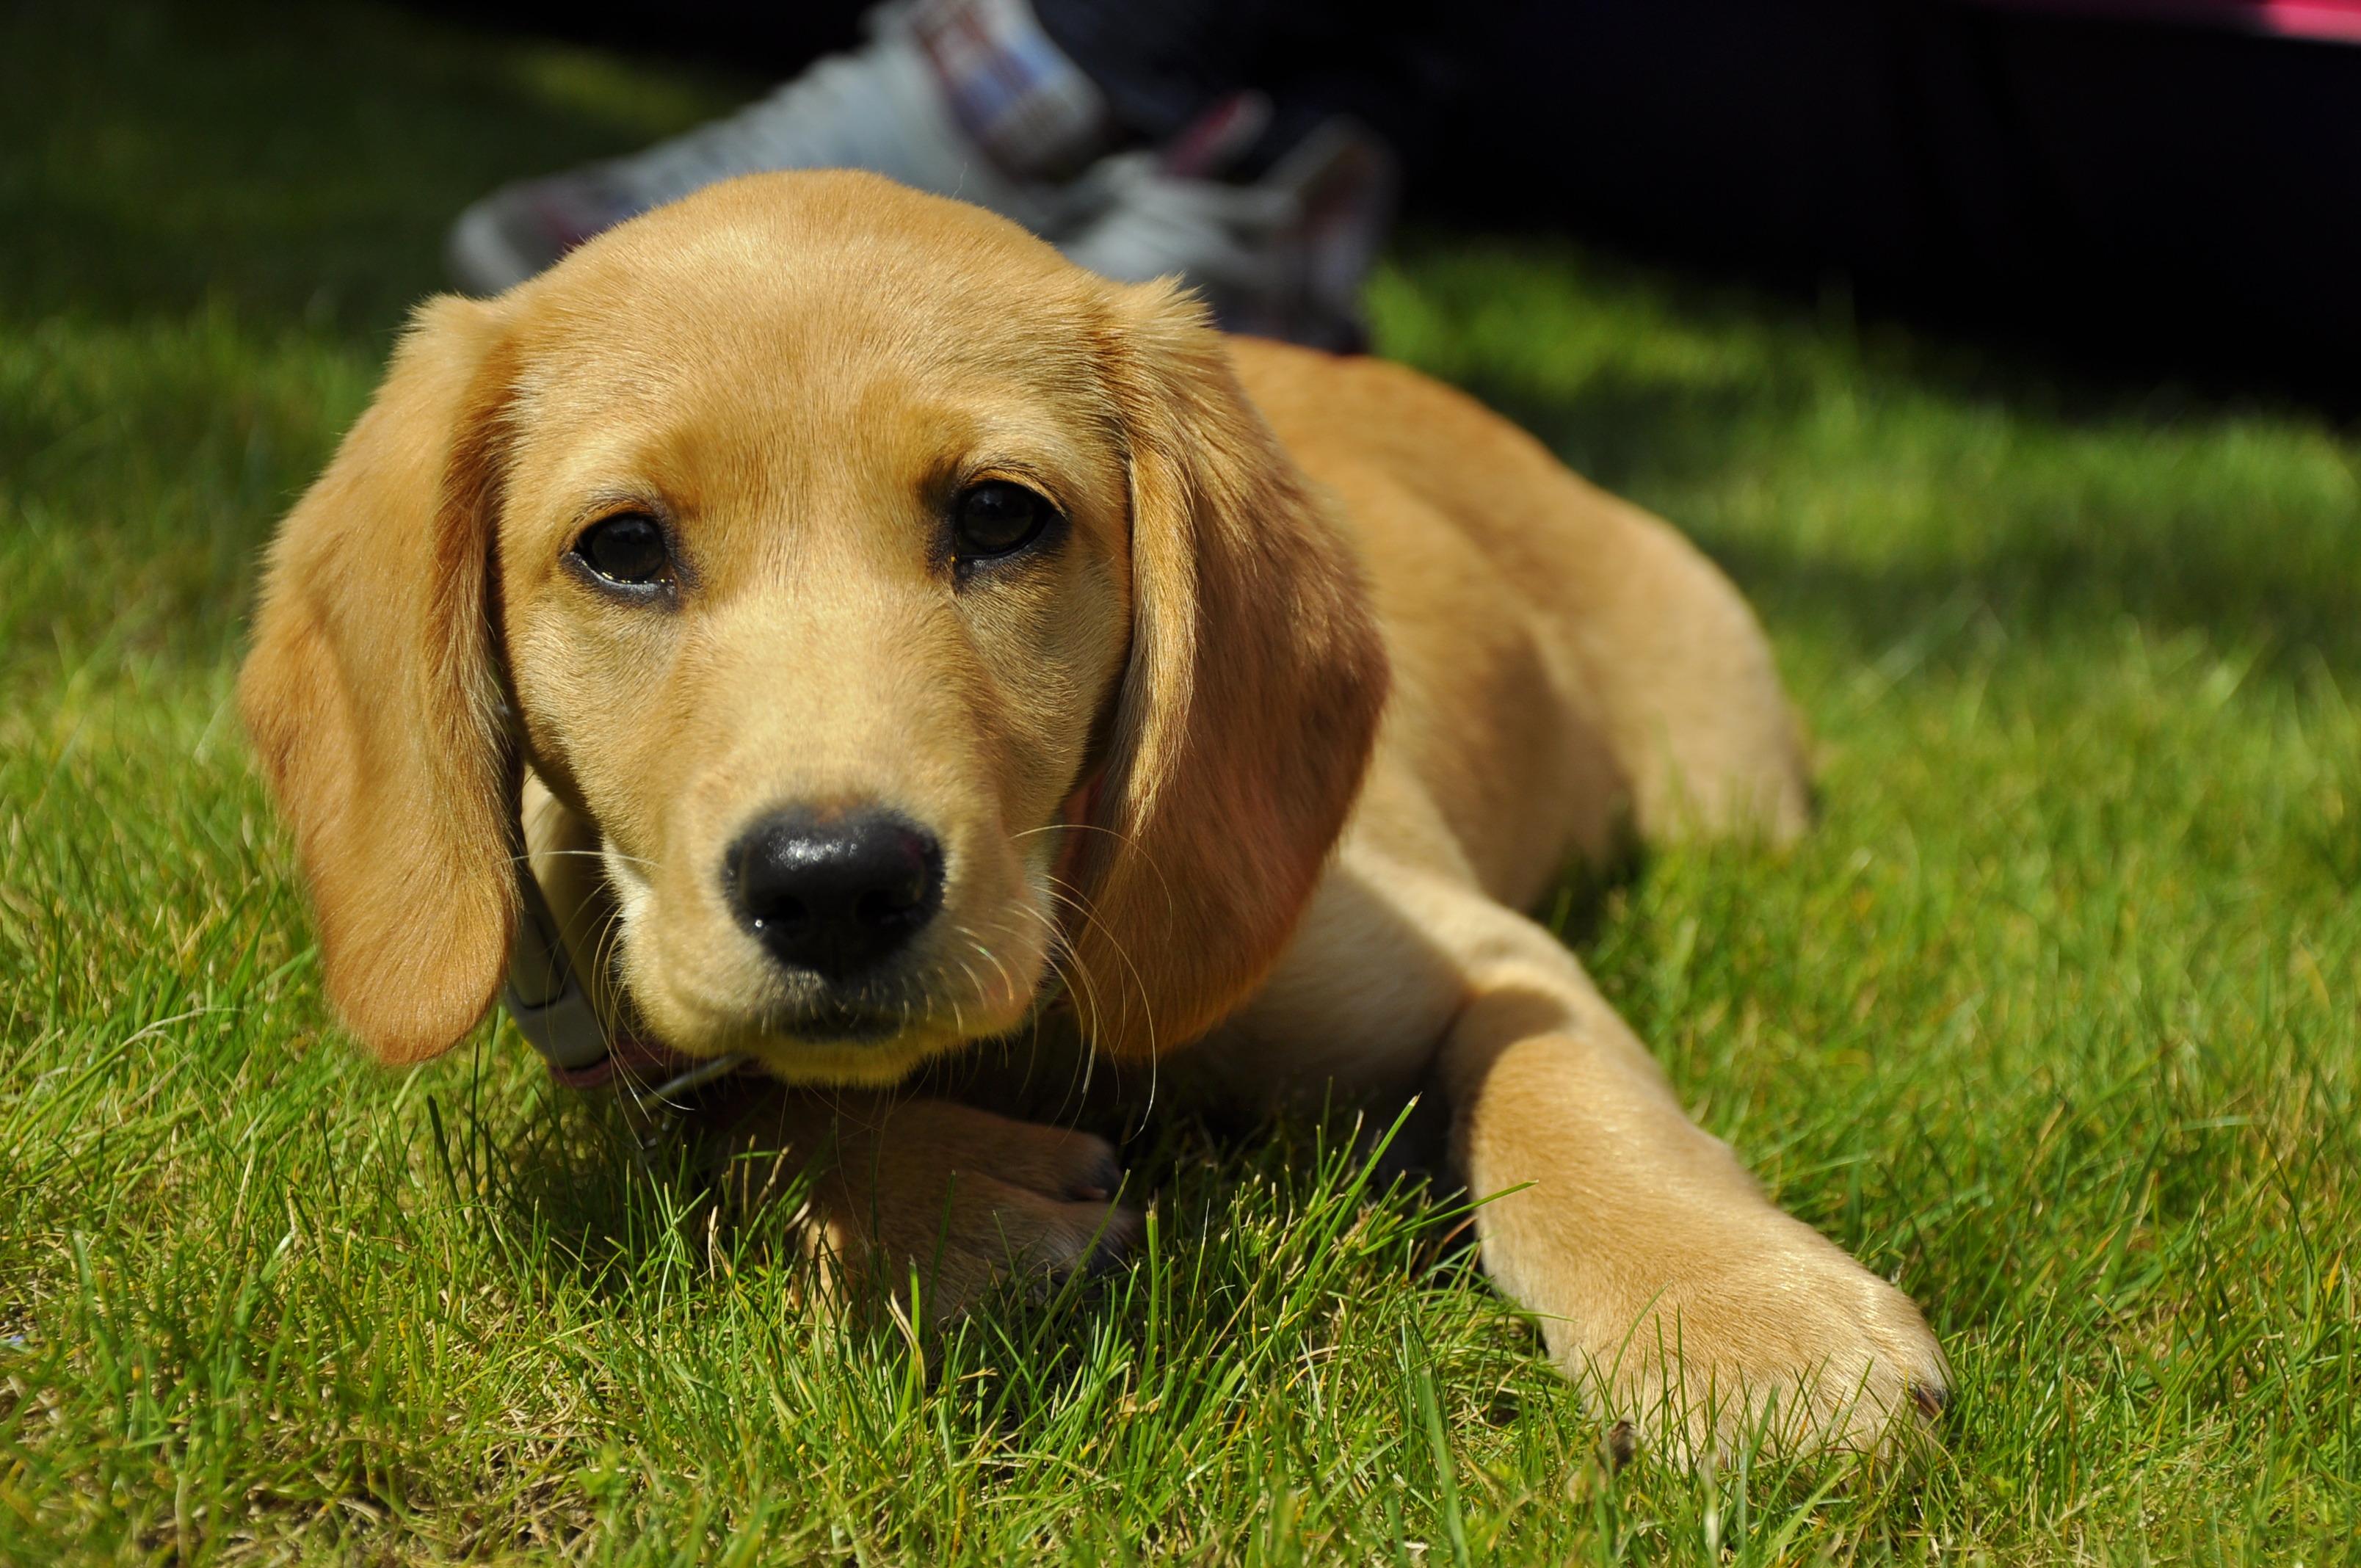 Dog Breeds Similar To Bichon Frise